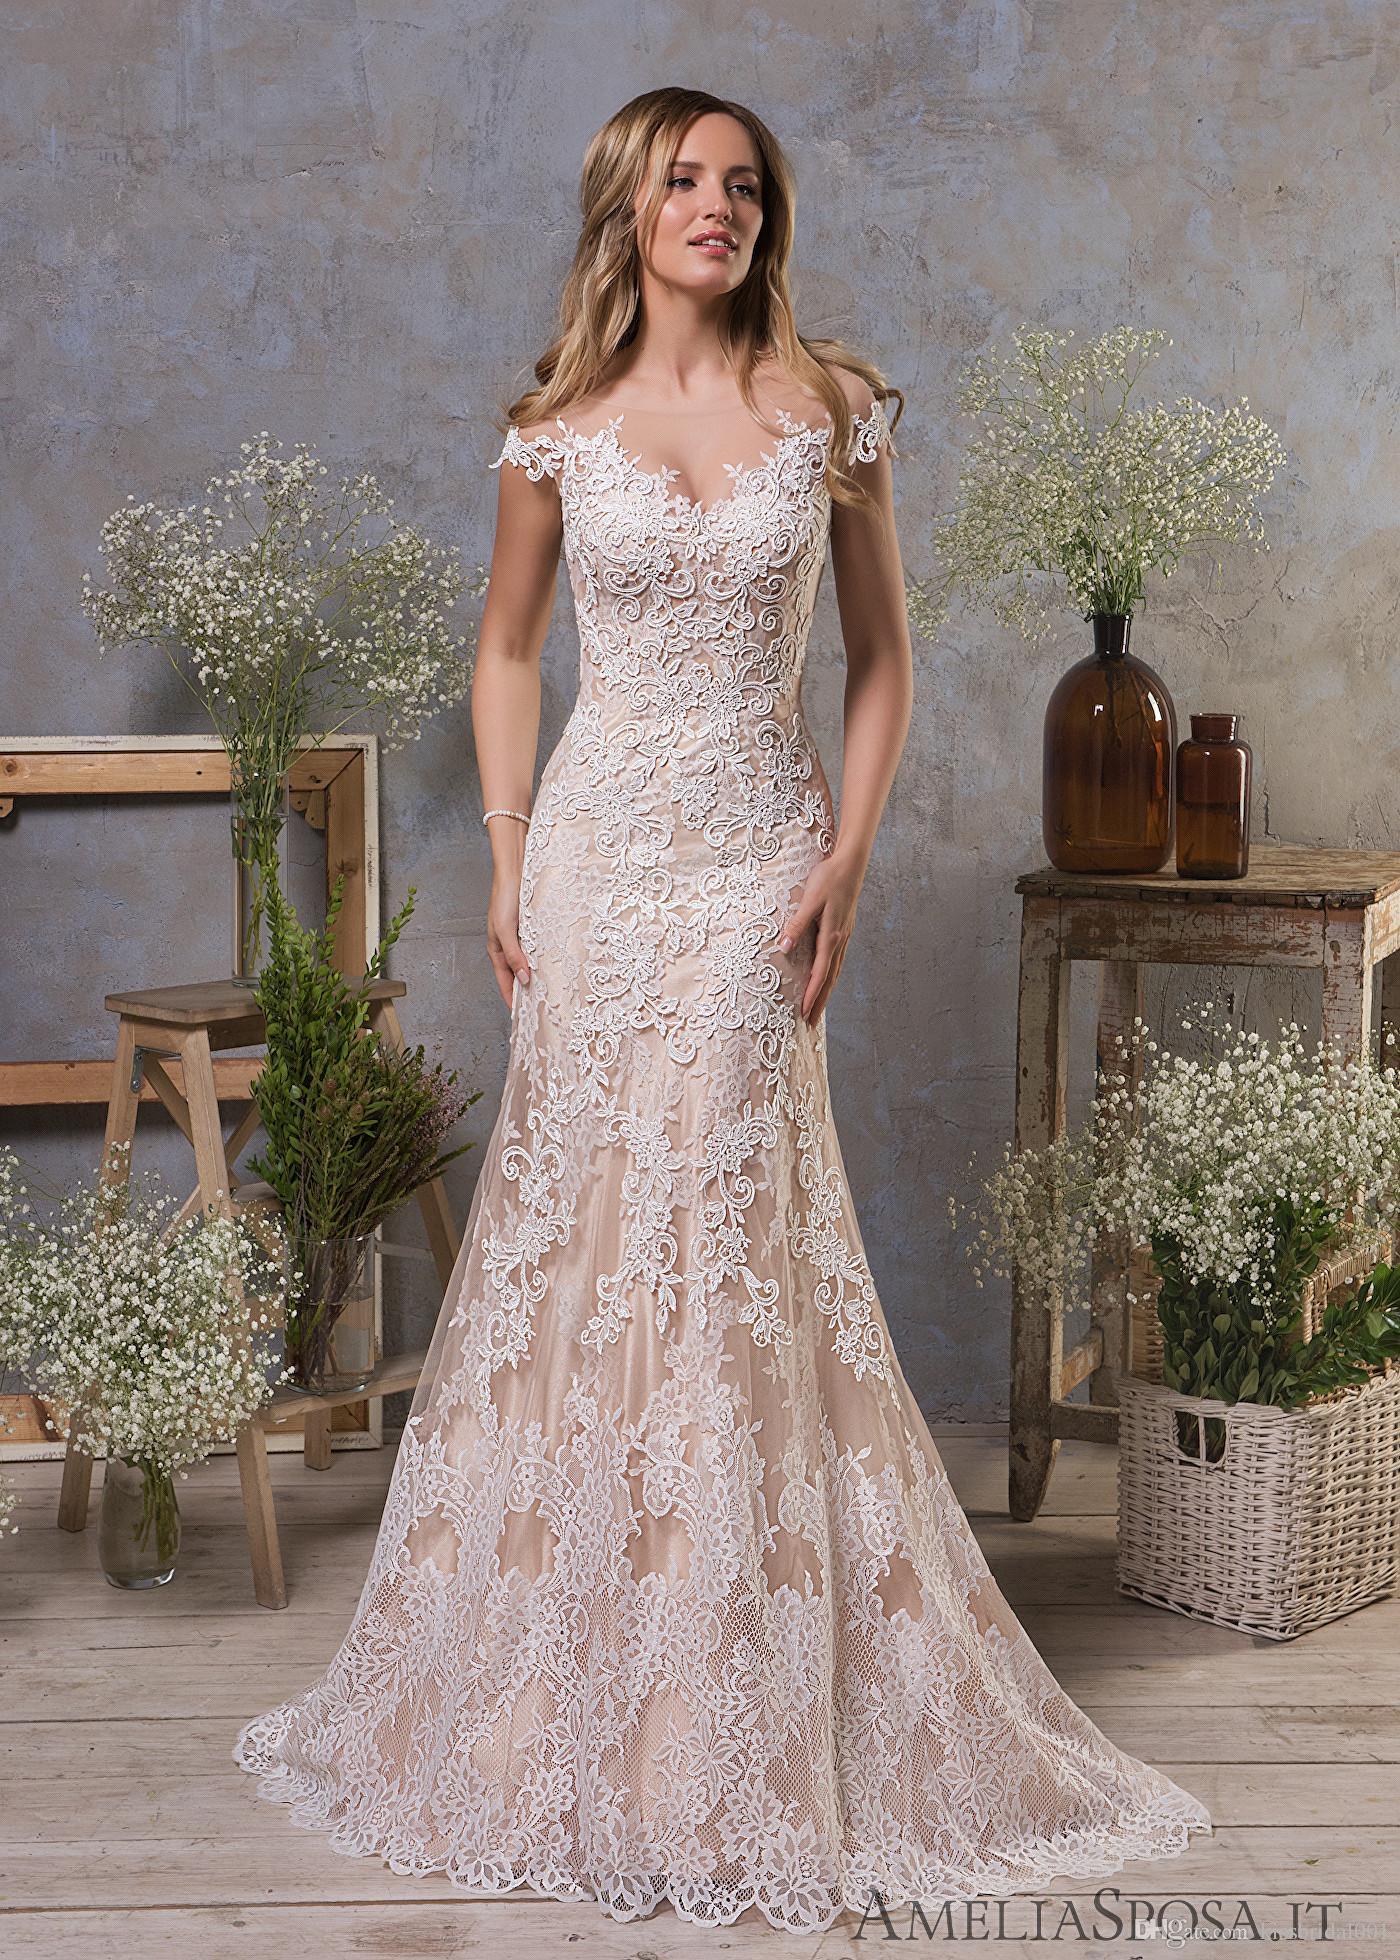 vintage lace wedding dresses 2019 sexy mermaid scalloped short sleeve  bridal gowns sheer illusion bride formal dress gown vestidos de novia  halter